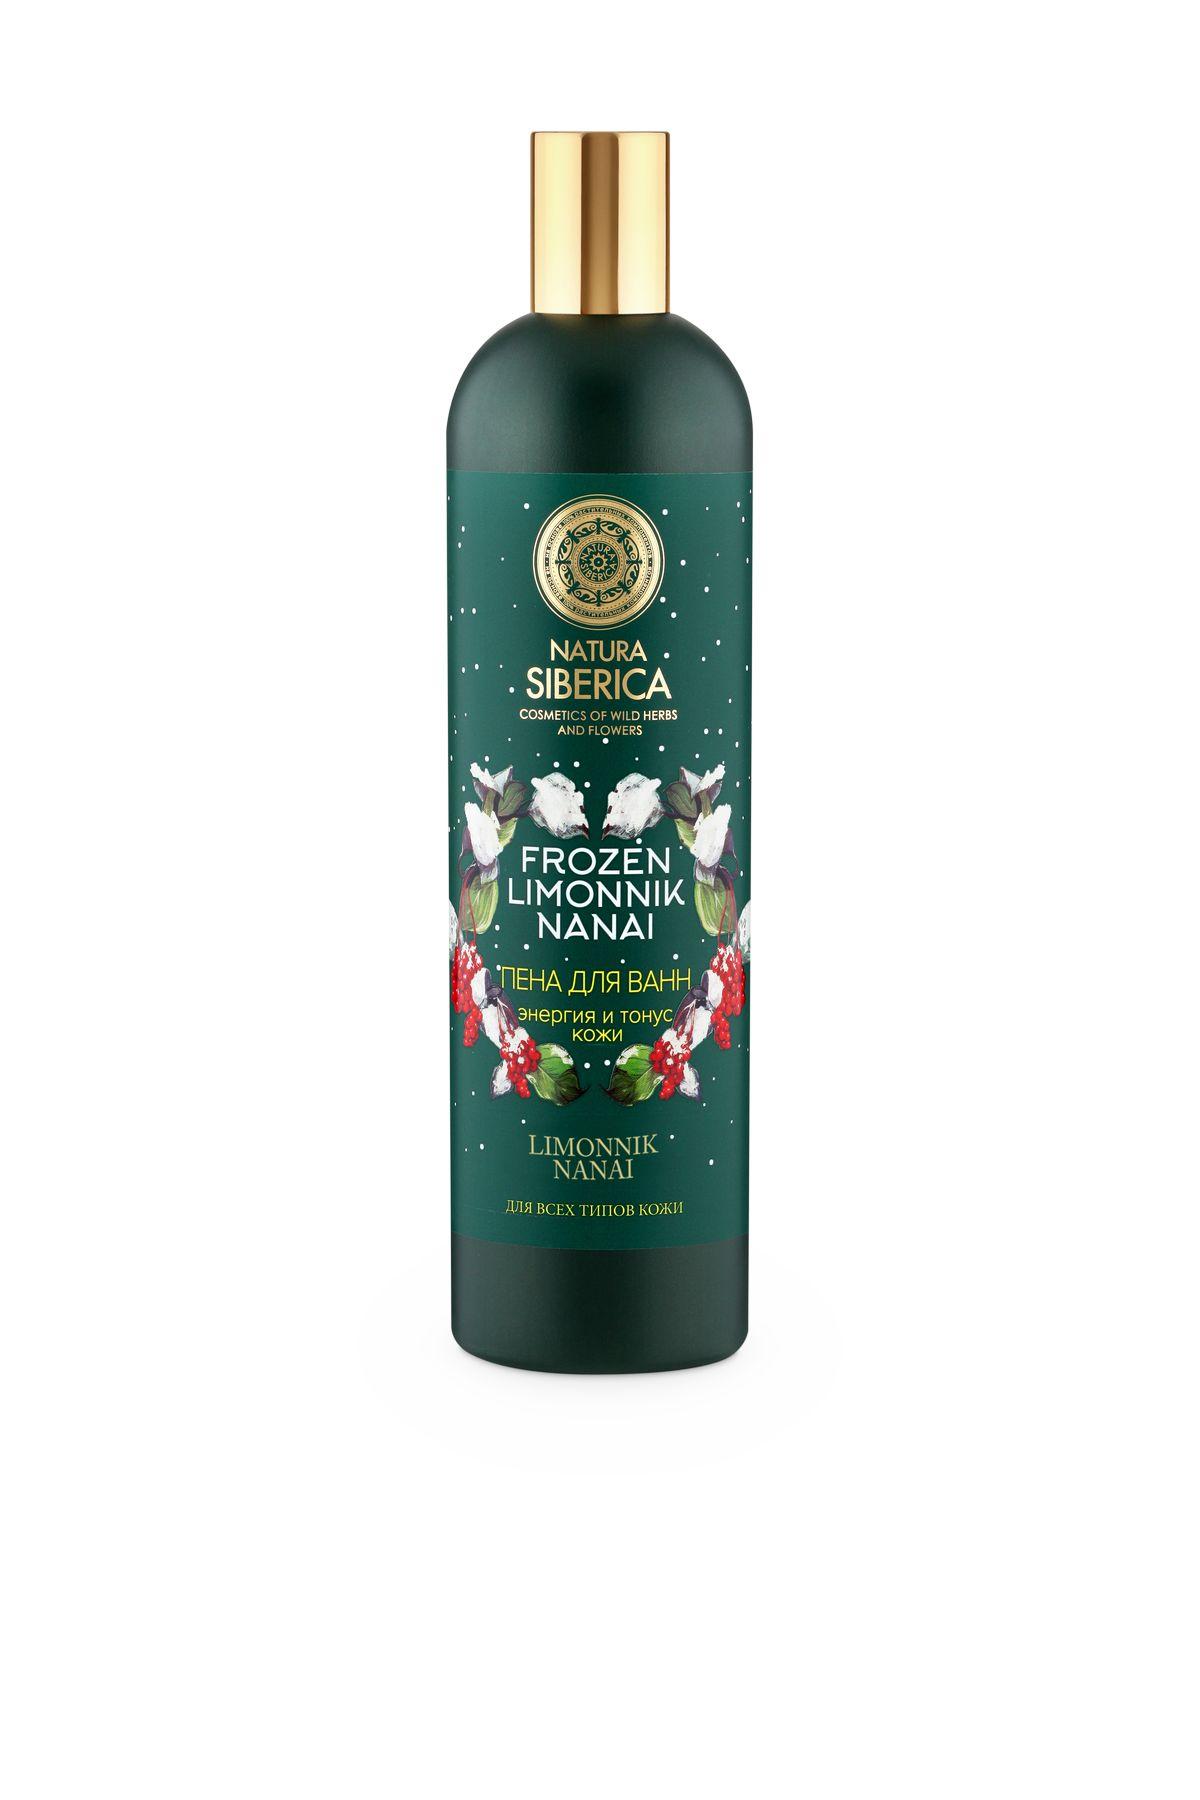 Natura Siberica Frozen limonnik nanai Пена для ванн Энергия и тонус кожи, 550 мл